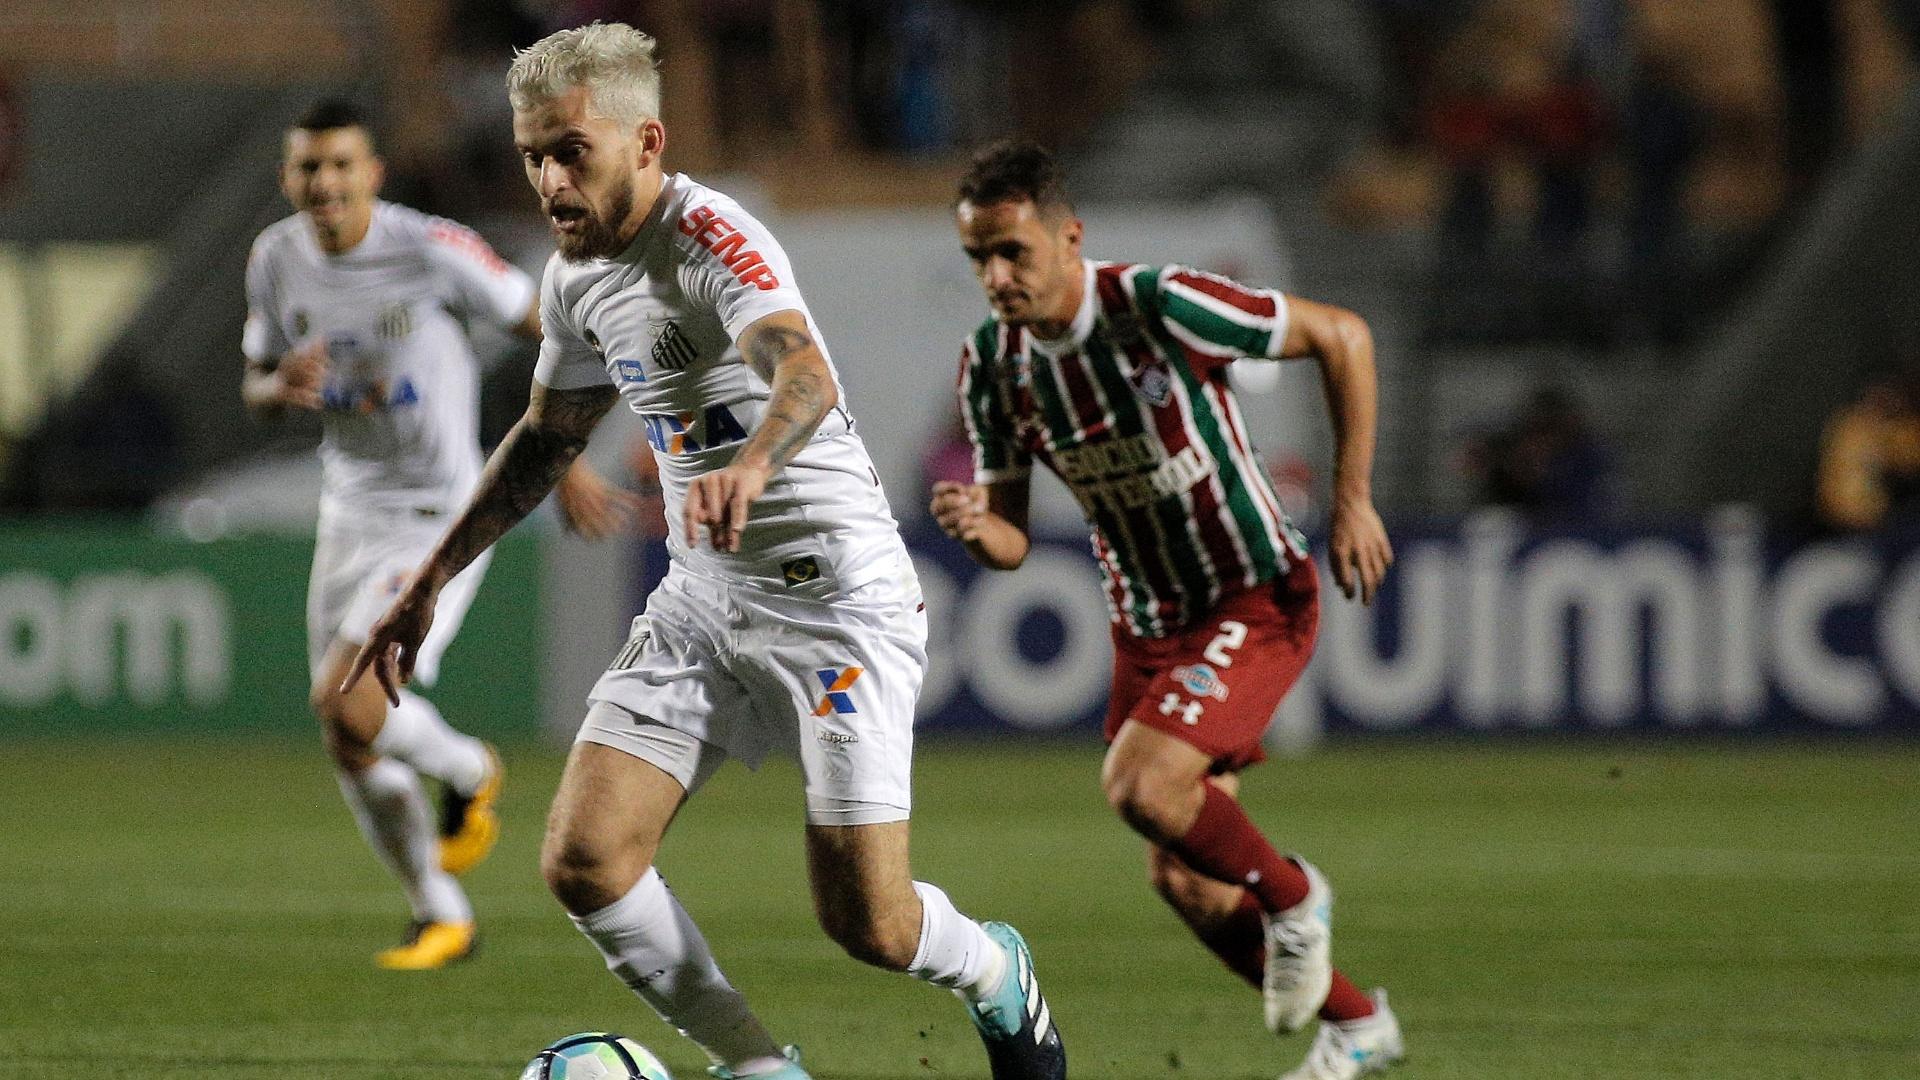 Lucas Lima no jogo entre Santos e Fluminense pelo Campeonato Brasileiro